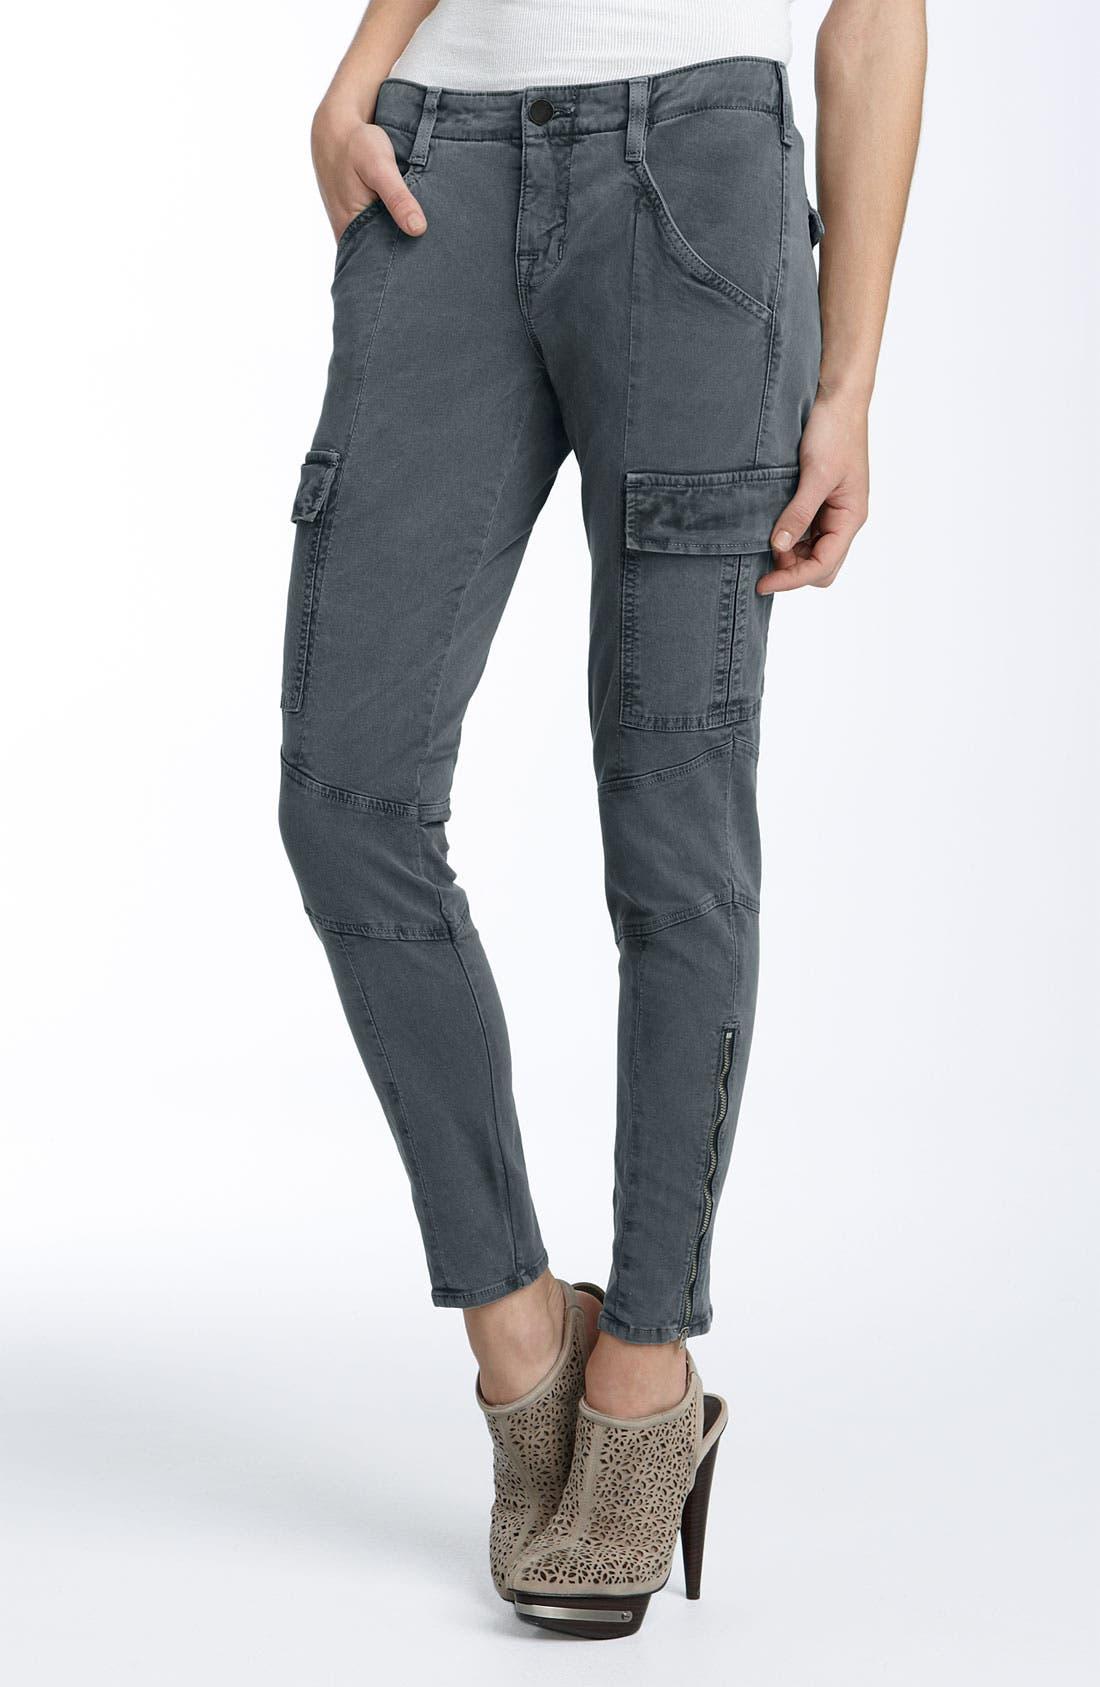 'Houlihan' Skinny Stretch Cotton Cargo Pants, Main, color, 001